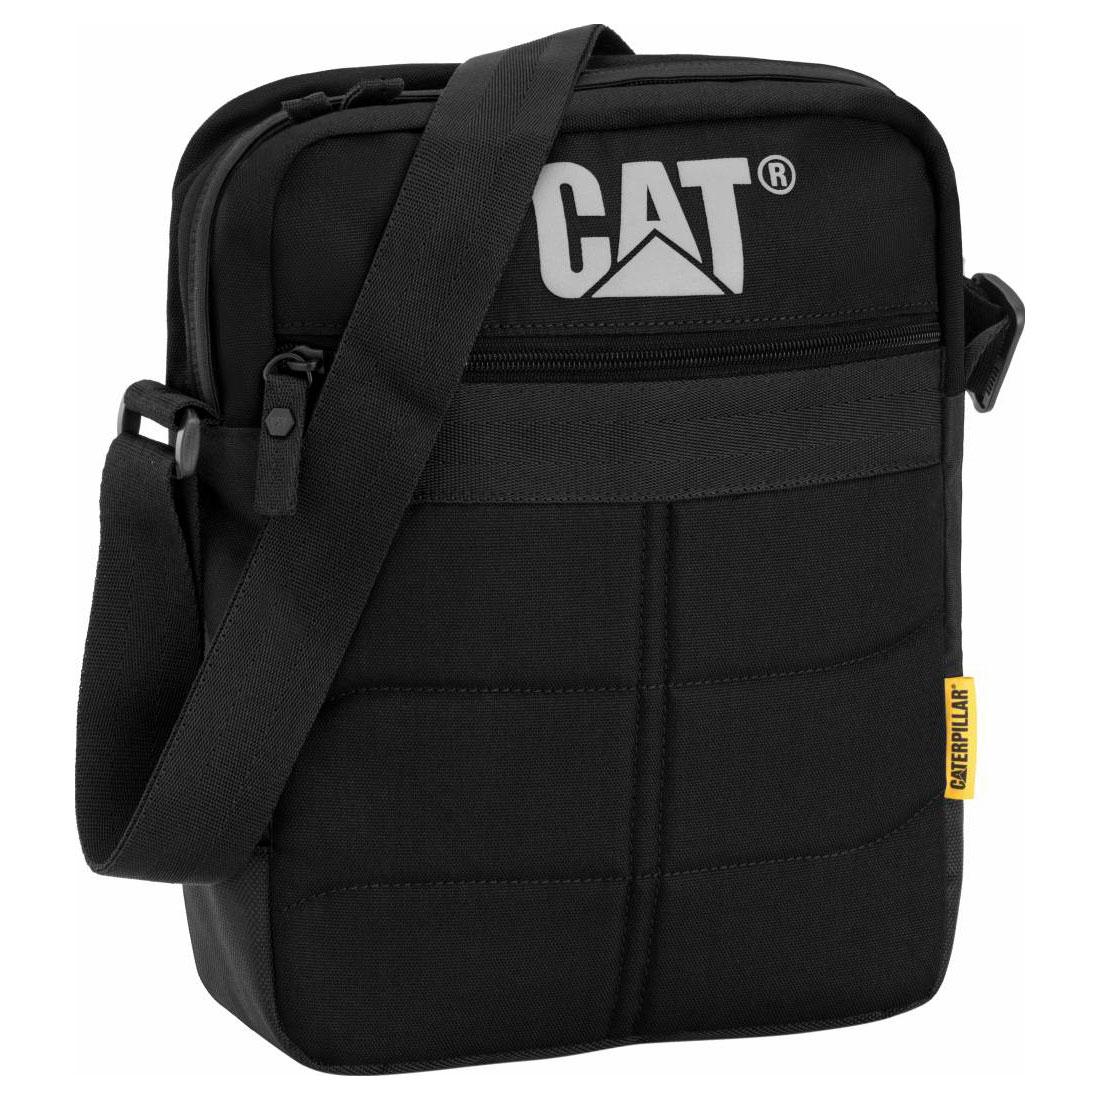 caterpillar cat ryan noir etui tablette cat sur. Black Bedroom Furniture Sets. Home Design Ideas